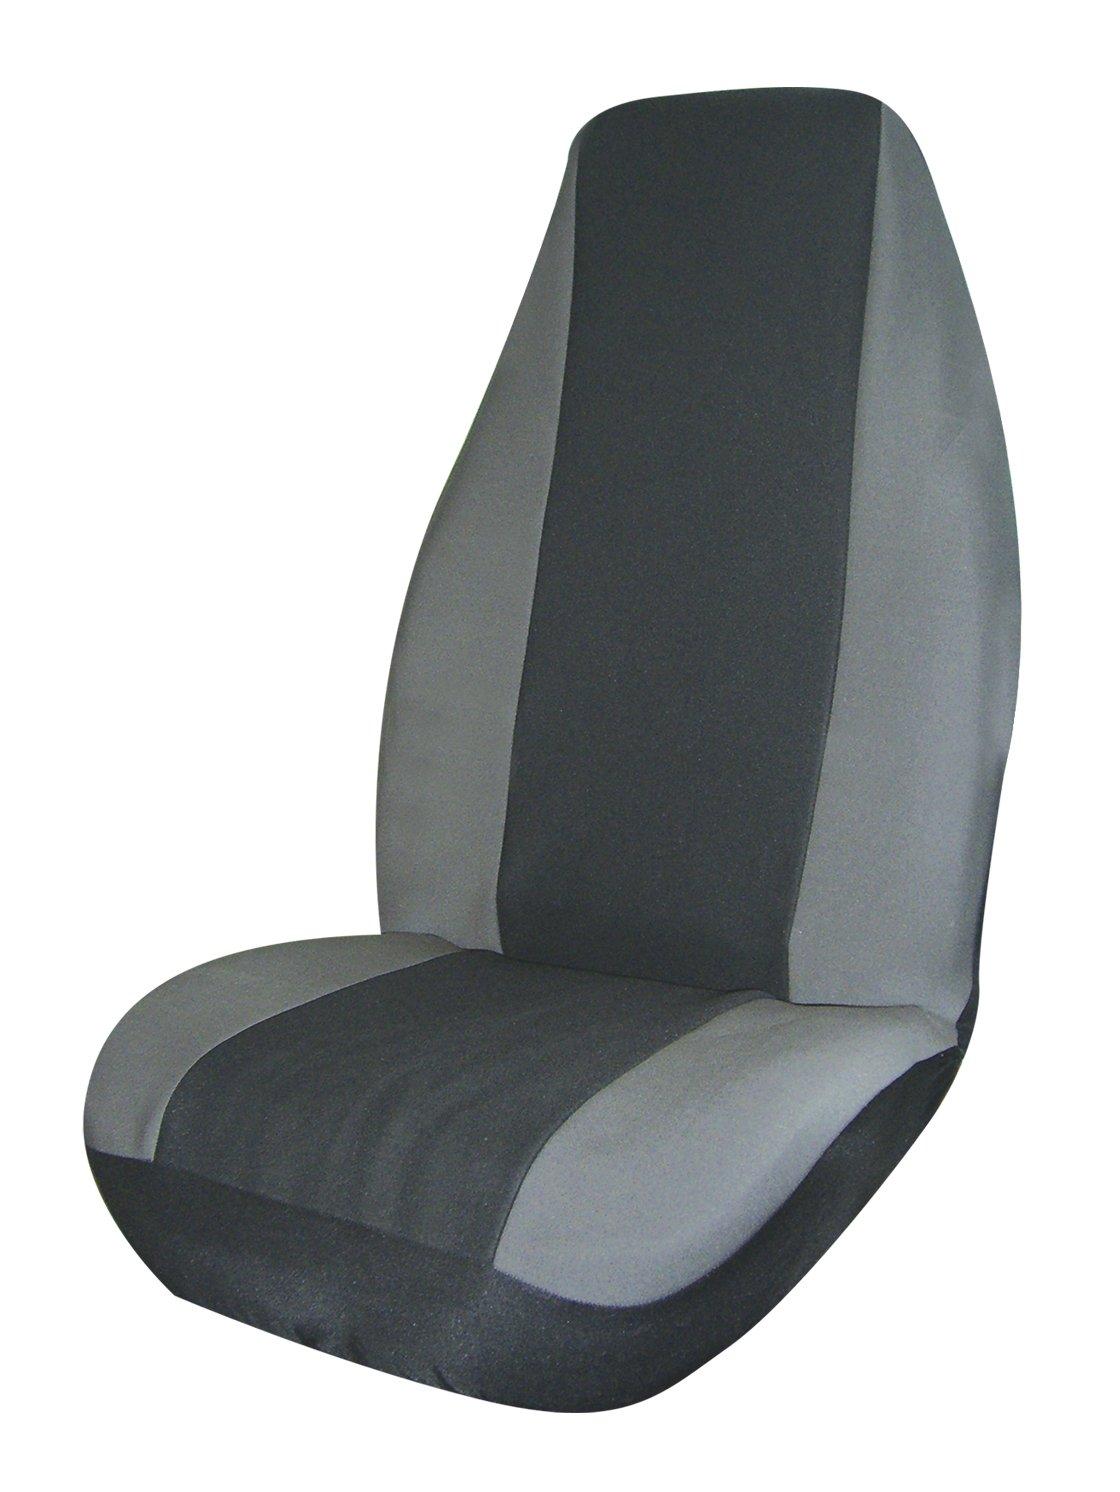 Allison 67-8736GRY Gray Neoprene Universal Bucket Seat Cover Pack of 1